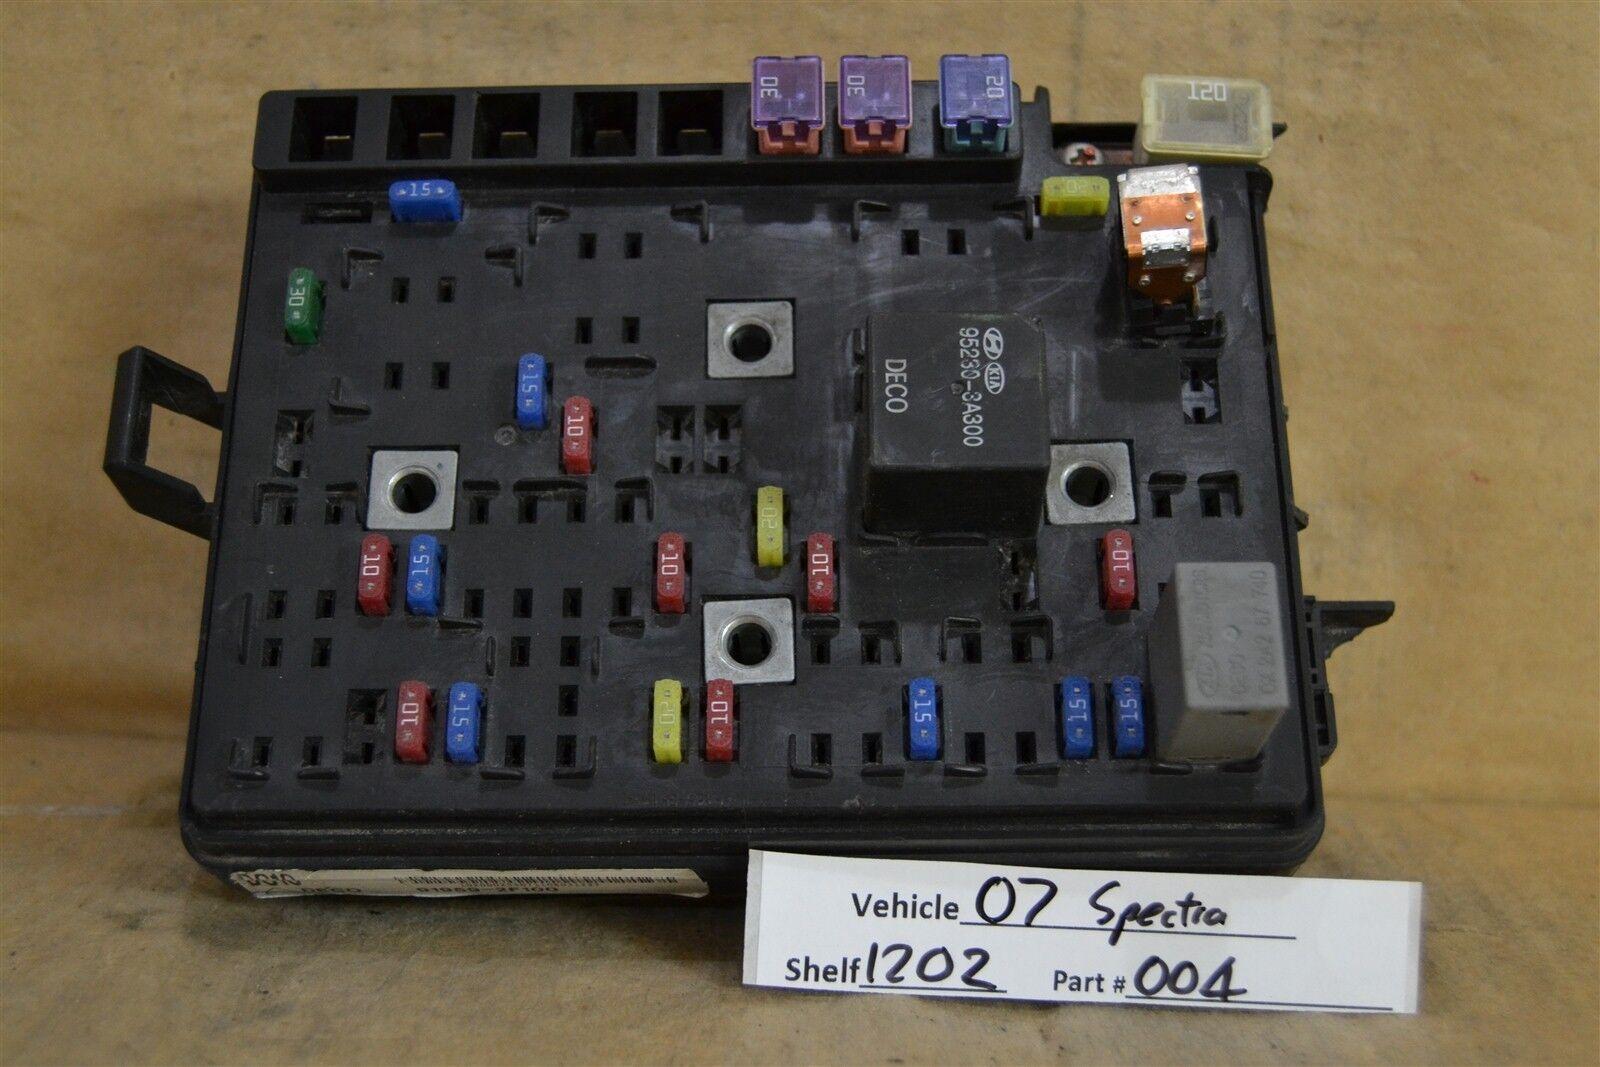 2008 Kia Spectra Fuse Box Location Wiring Library Sorento 2007 Relay Unit 919592f100 Module 2004 12o2